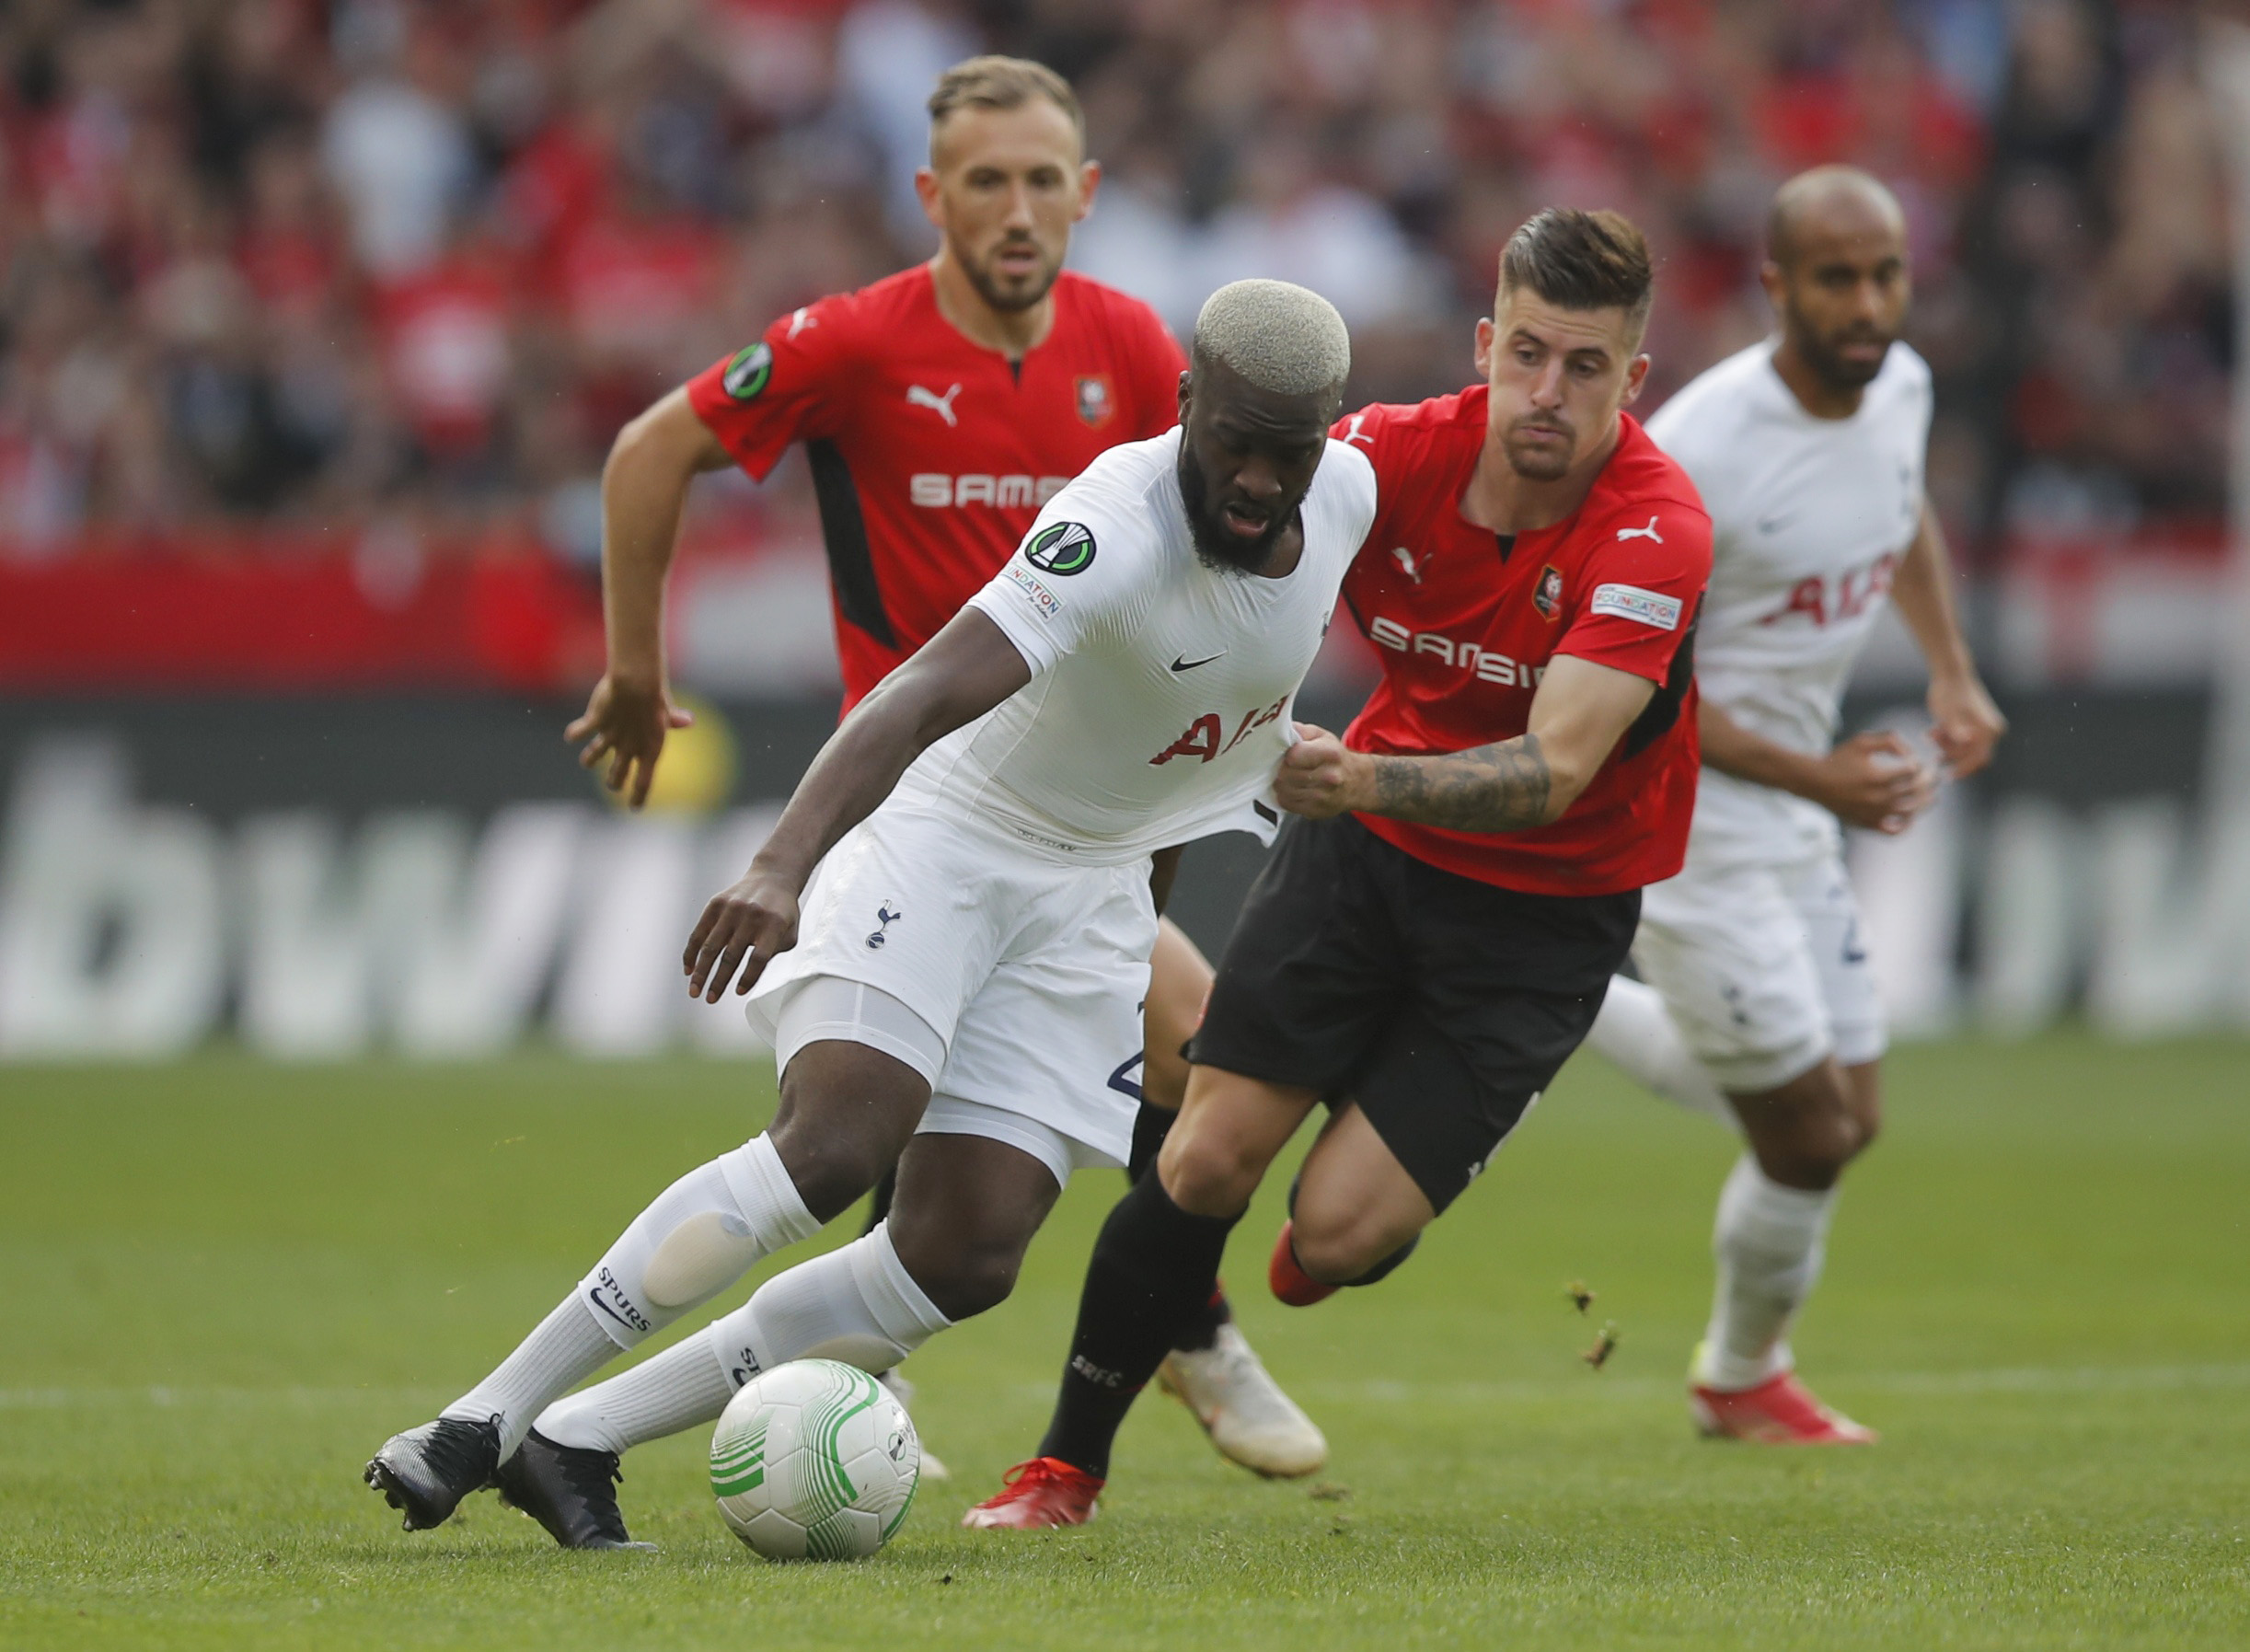 Conference League, Ρεν – Τότεναμ 2-2: Ματσάρα και ισοπαλία στη Γαλλία